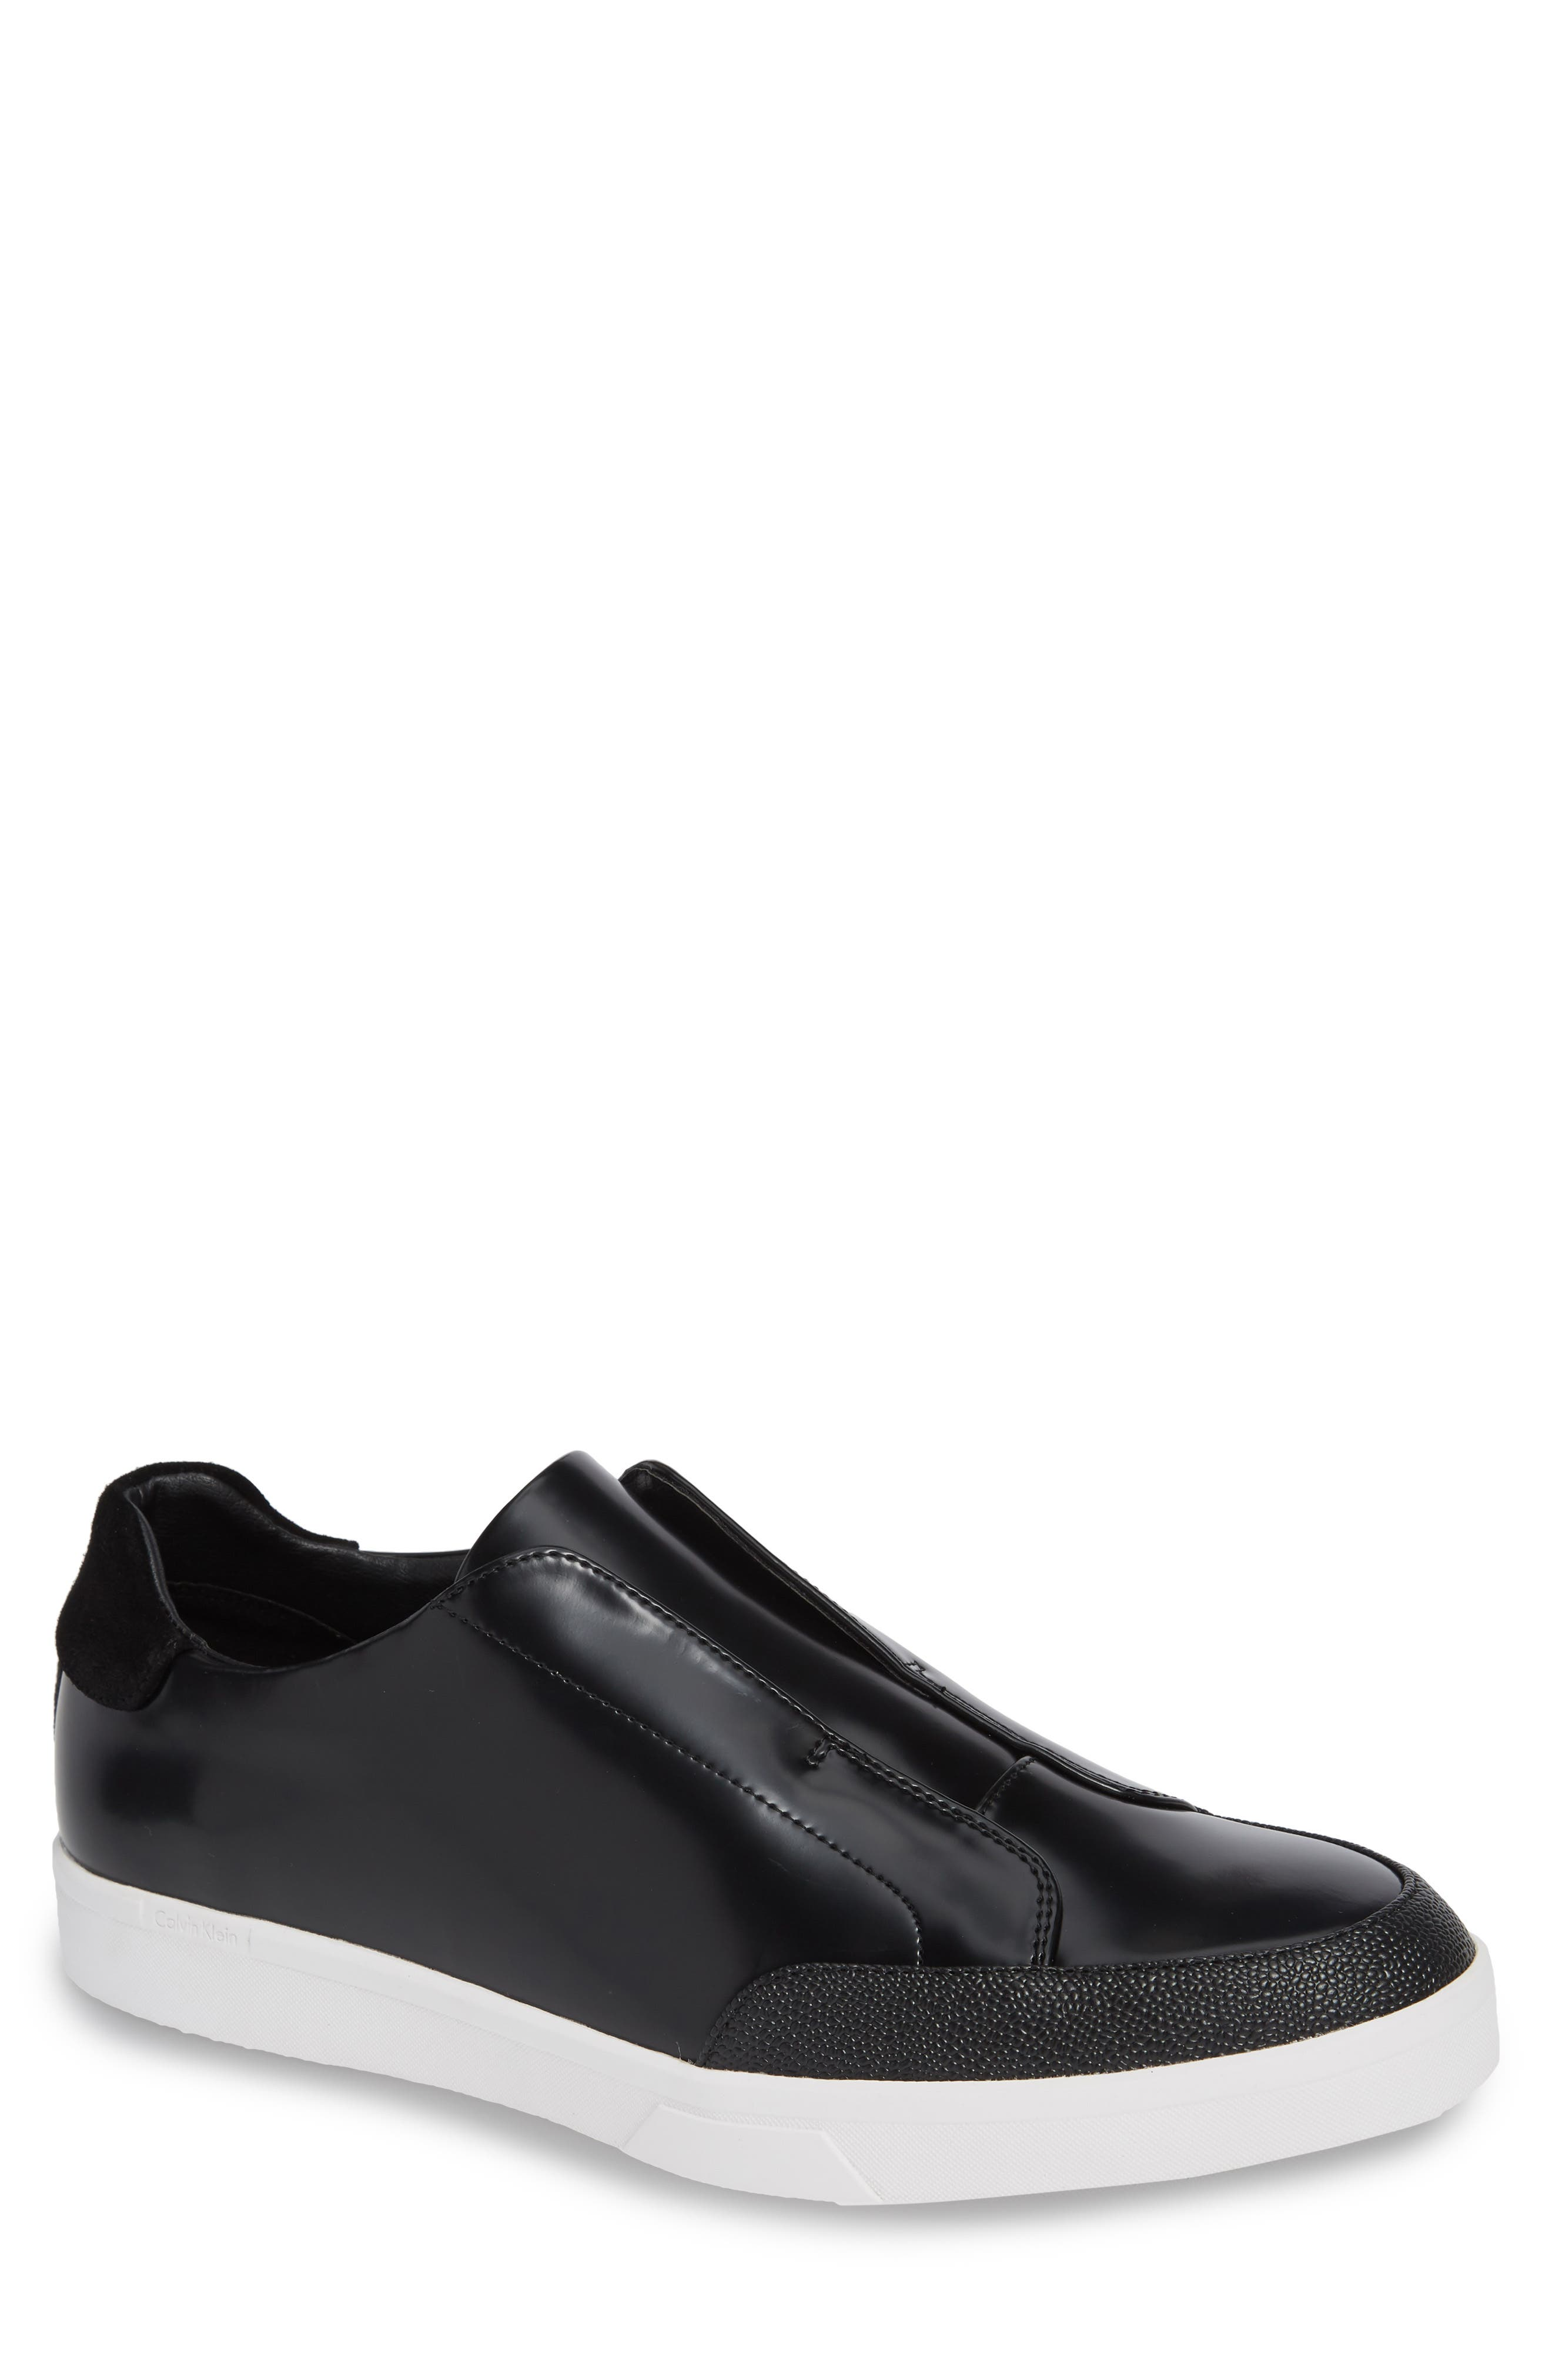 CALVIN KLEIN, Immanuel Slip-On Sneaker, Main thumbnail 1, color, BLACK LEATHER